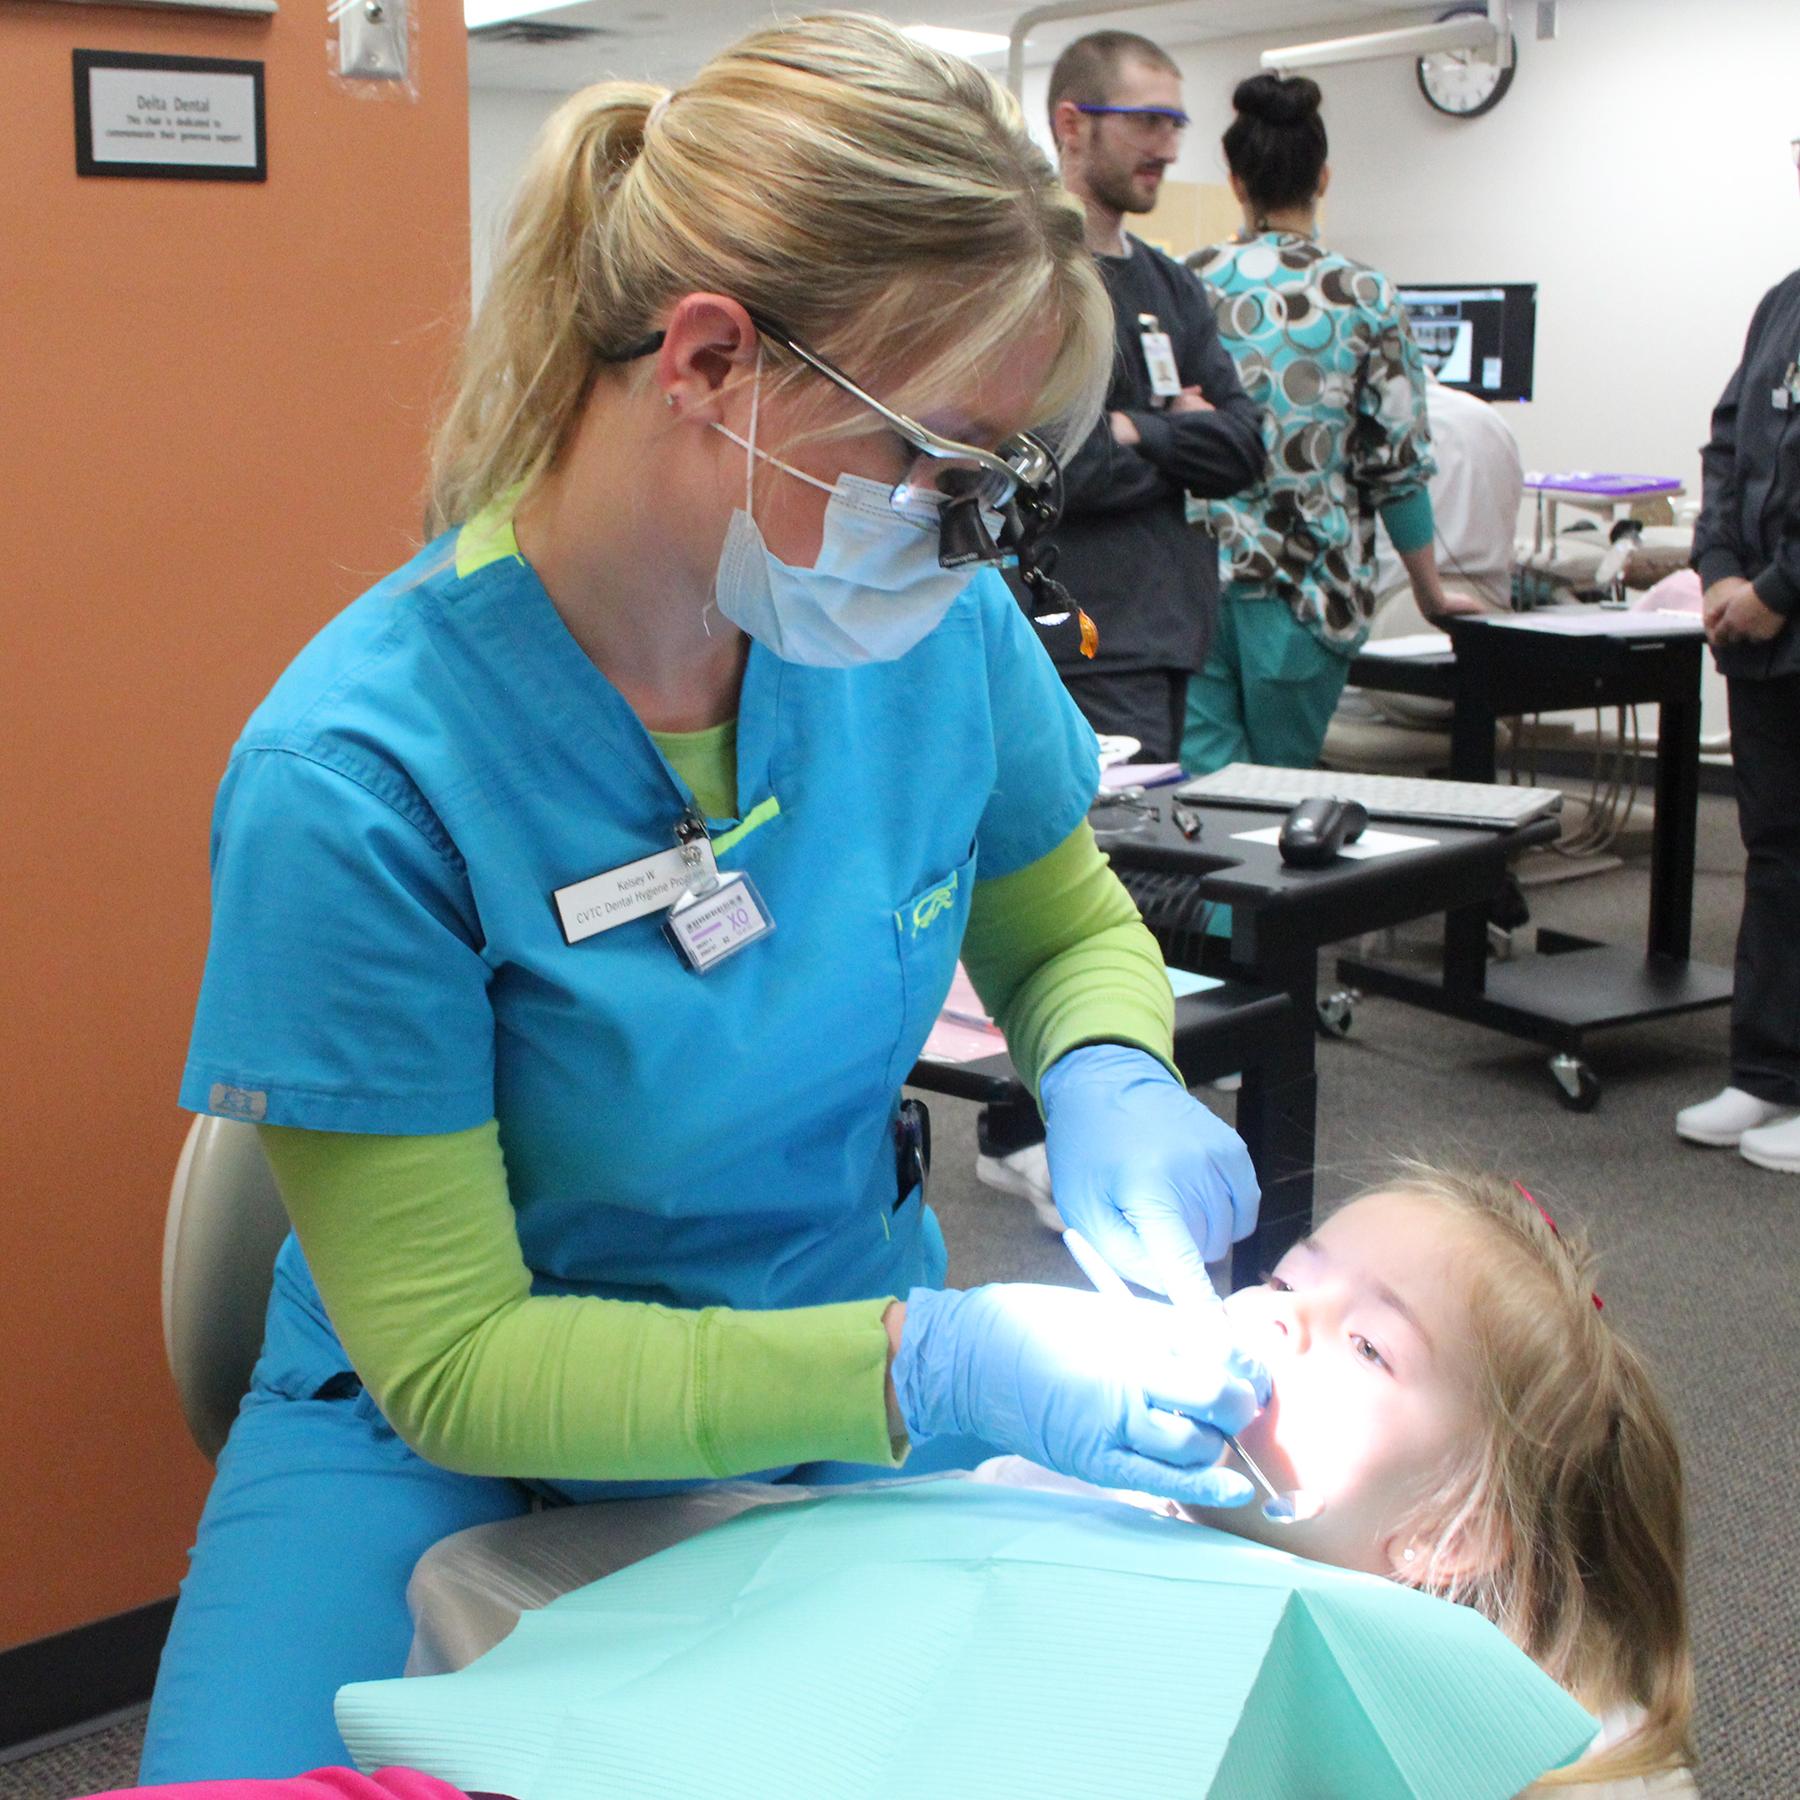 CVTC Dental Hygienist Student Kelsey Wirth Cleans The Teeth Of Anya Adkins 4